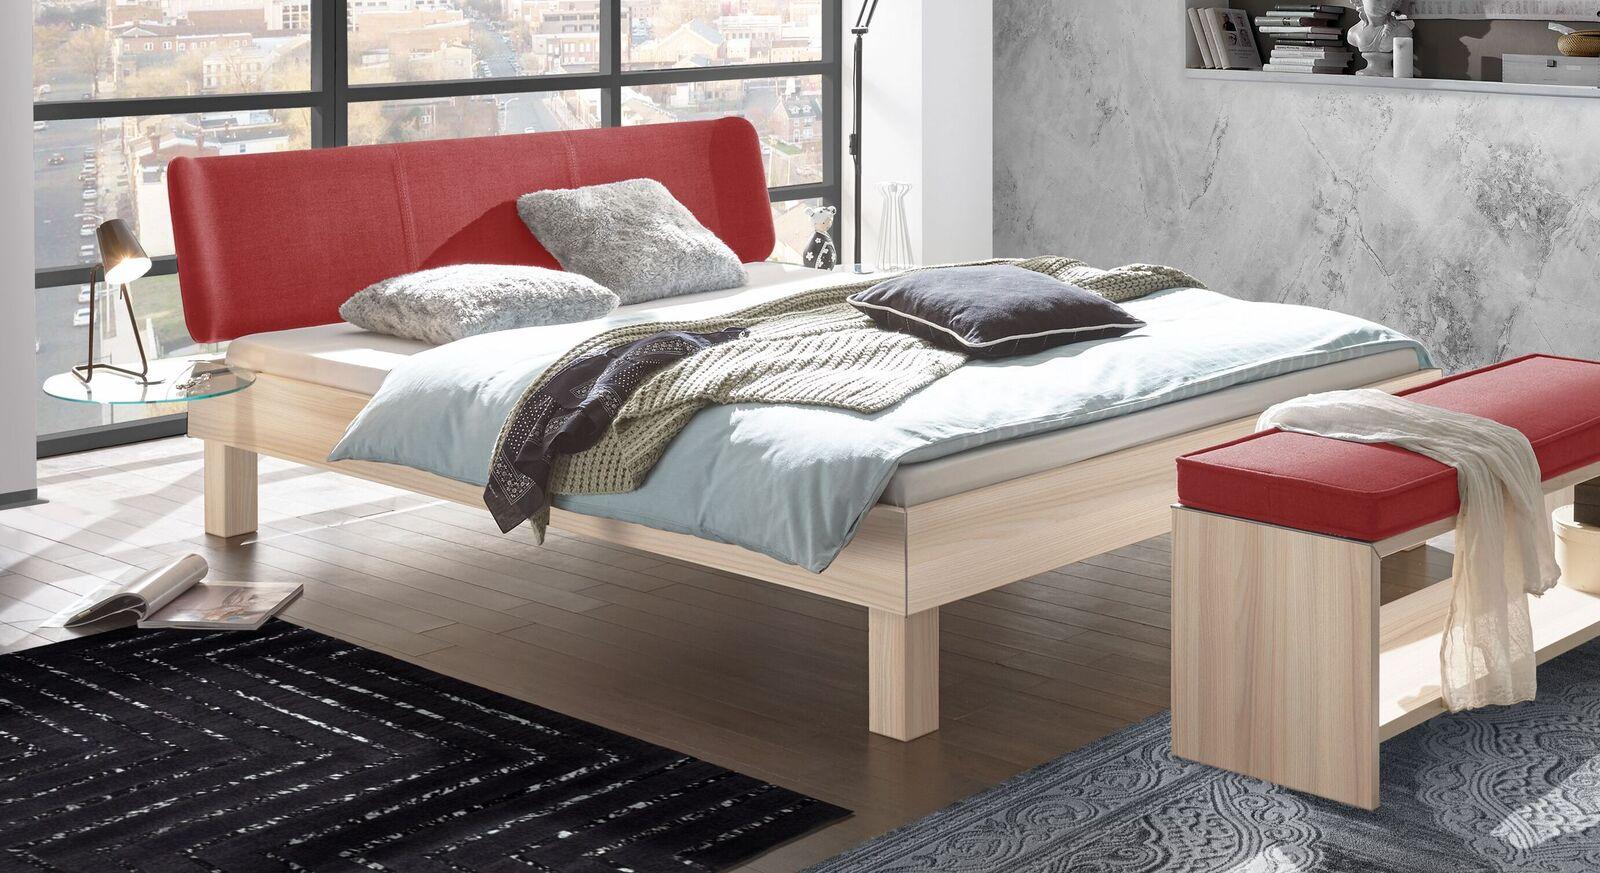 Bett Burlington mit Kopfteil in Rot